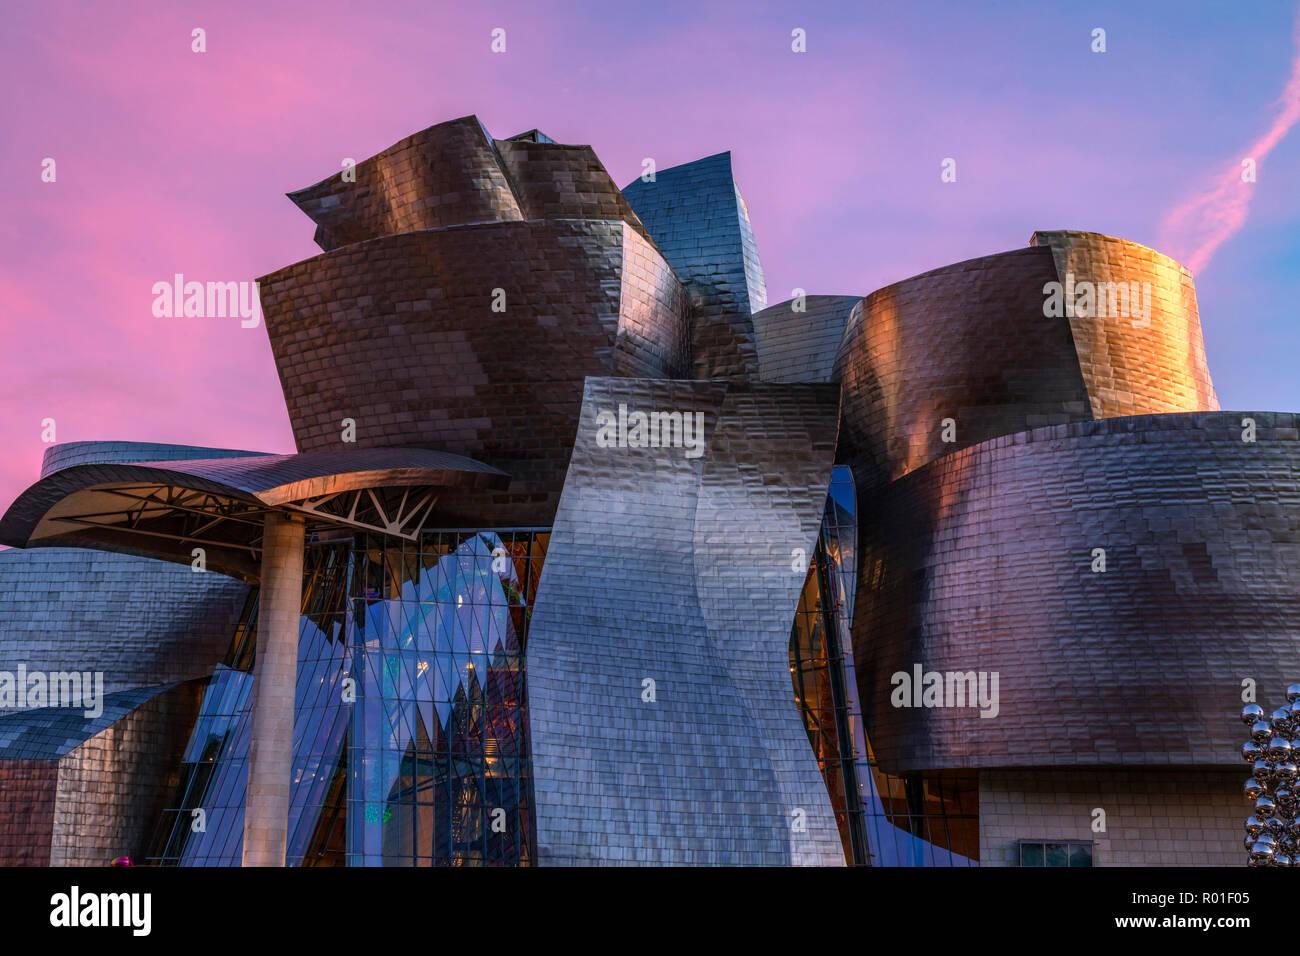 Guggenheim Museum, Bilbao, Pays Basque, Espagne, Europe Banque D'Images